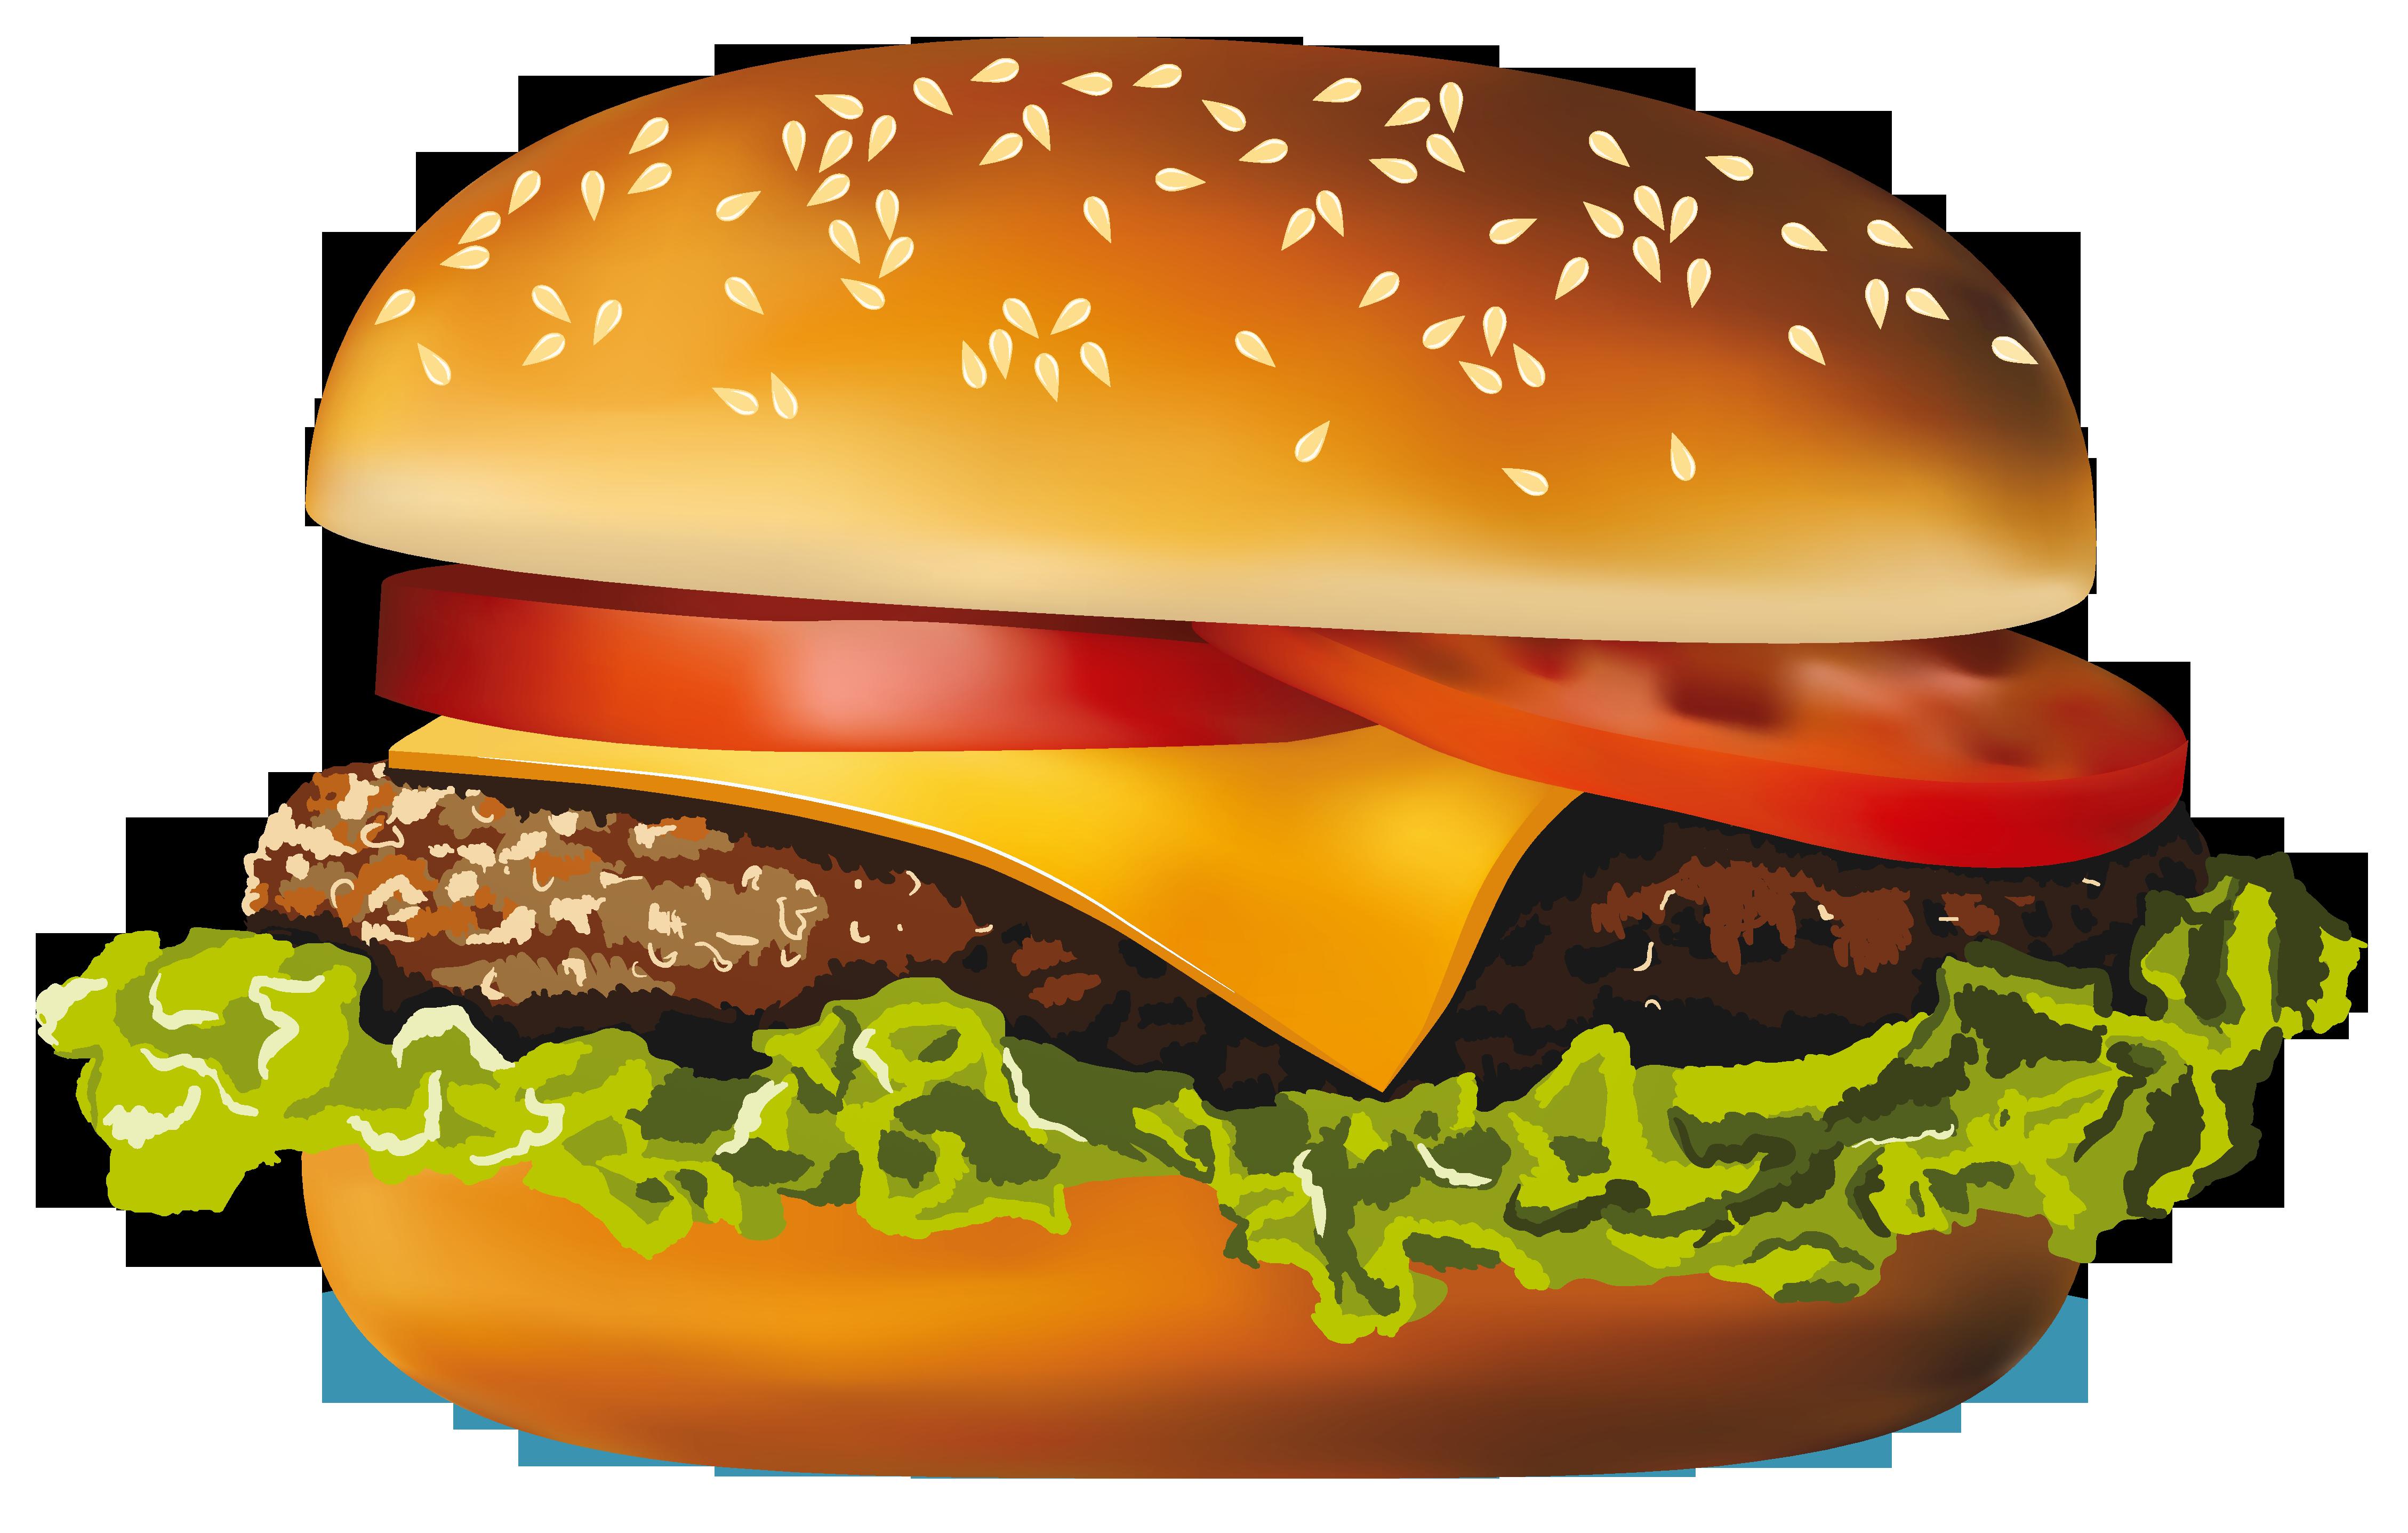 Veggie burger cliparts free download clip art png.